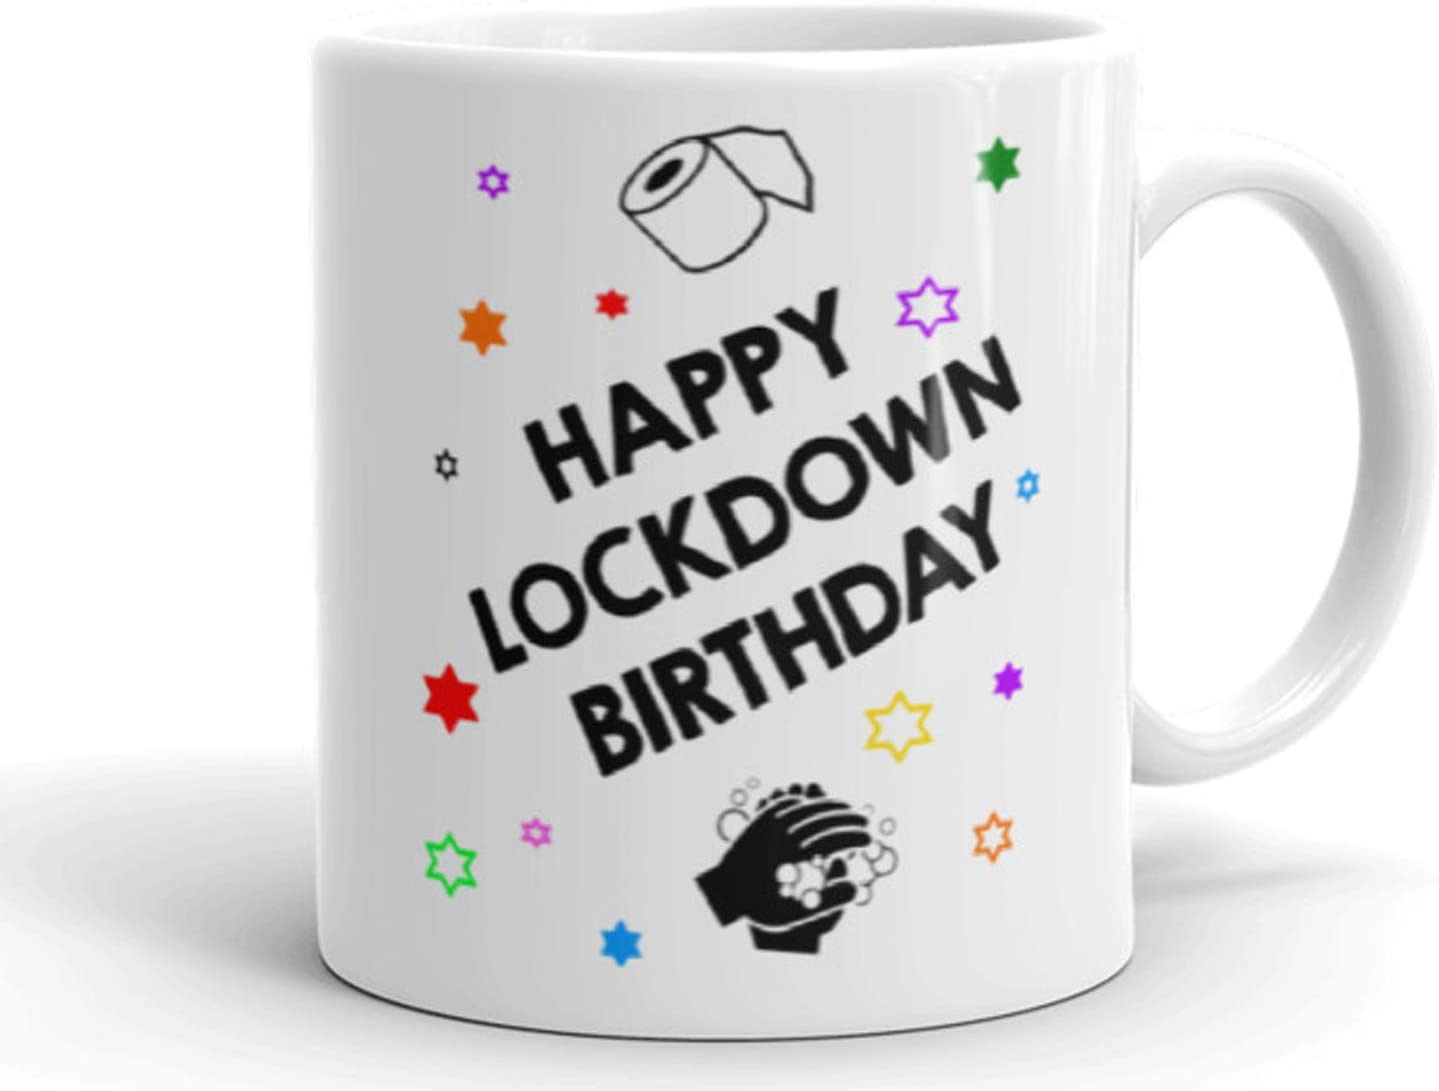 Happy Lockdown Birthday Mug Social Distance Mug Happy Birthday Mug Lockdown